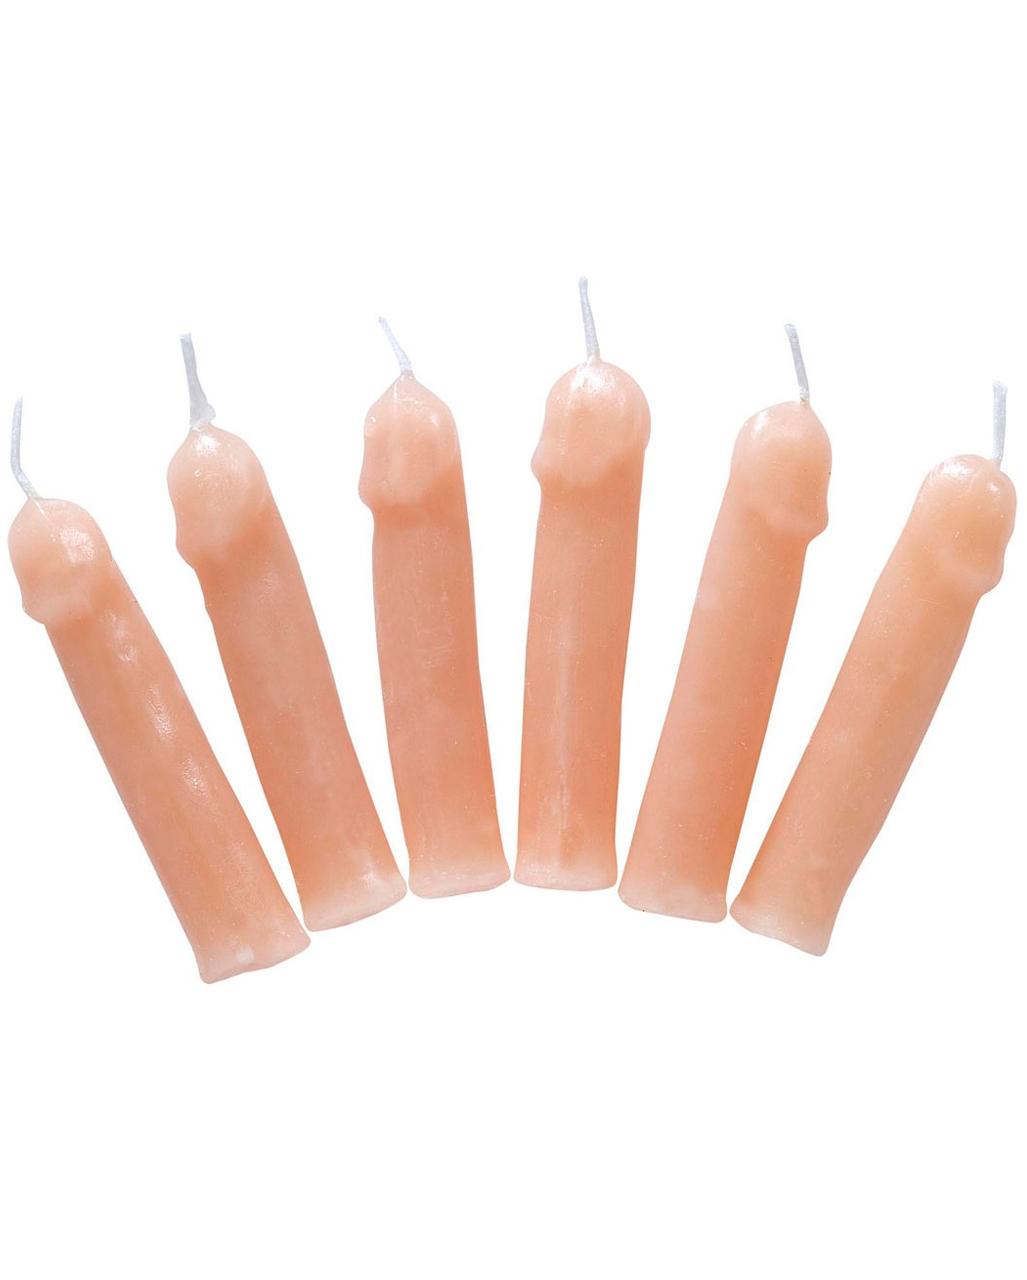 Bedste sexede penis